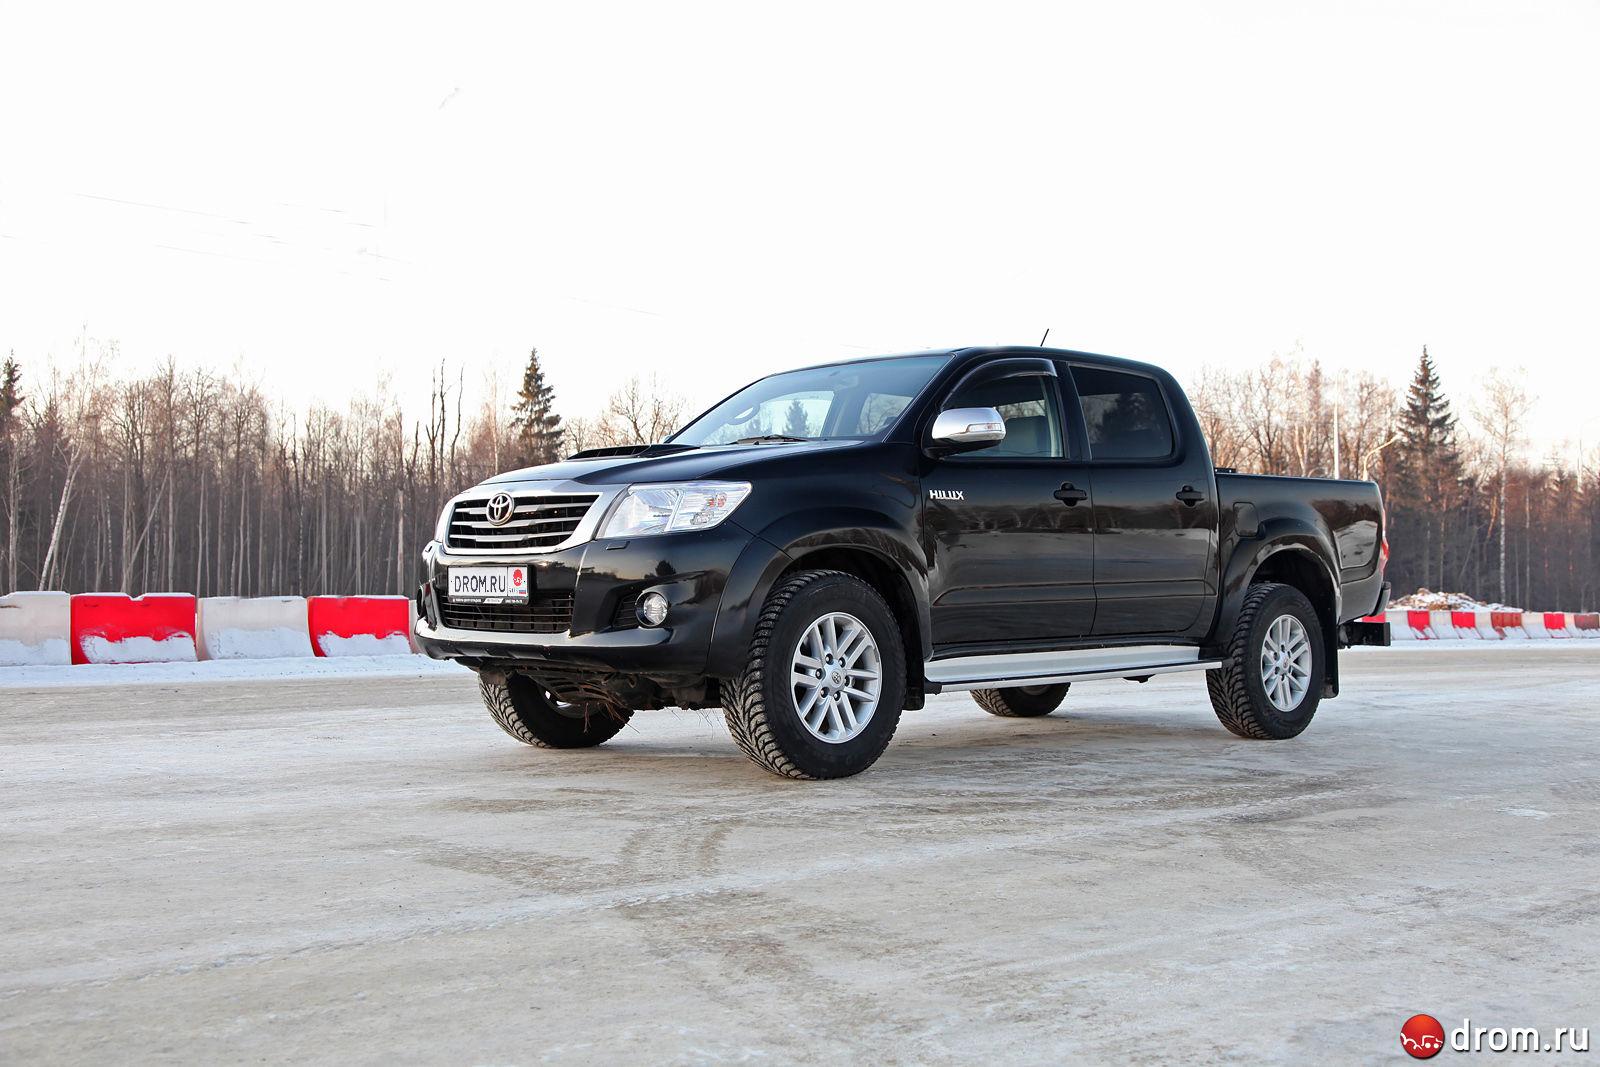 Продажа Toyota в Сургуте - surgut.drom.ru